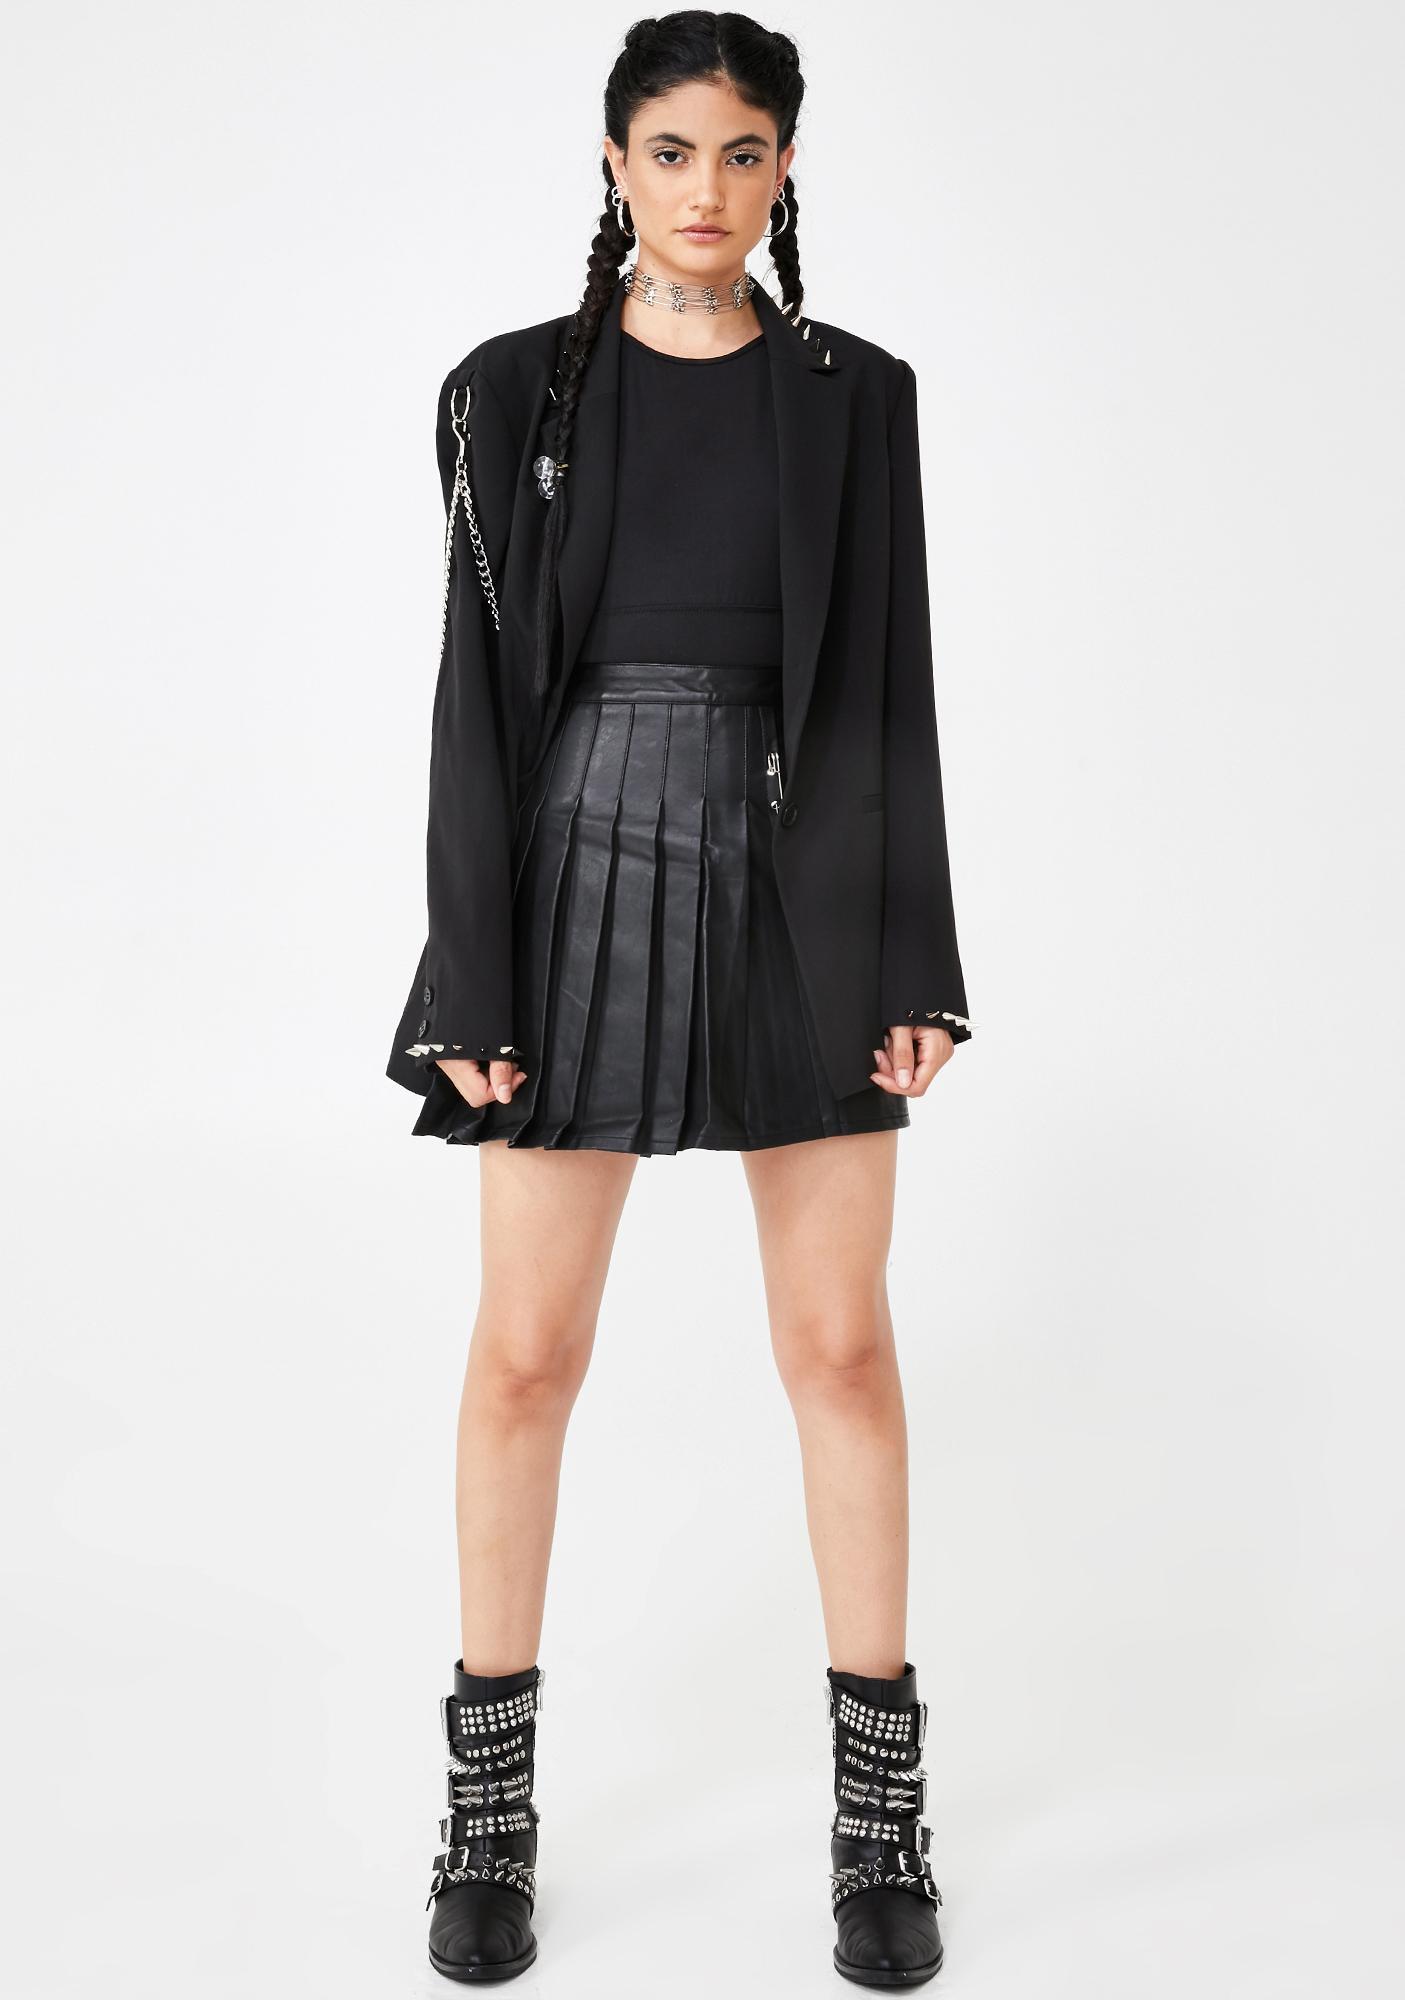 Kiki Riki Mad Respect Knit Bodysuit